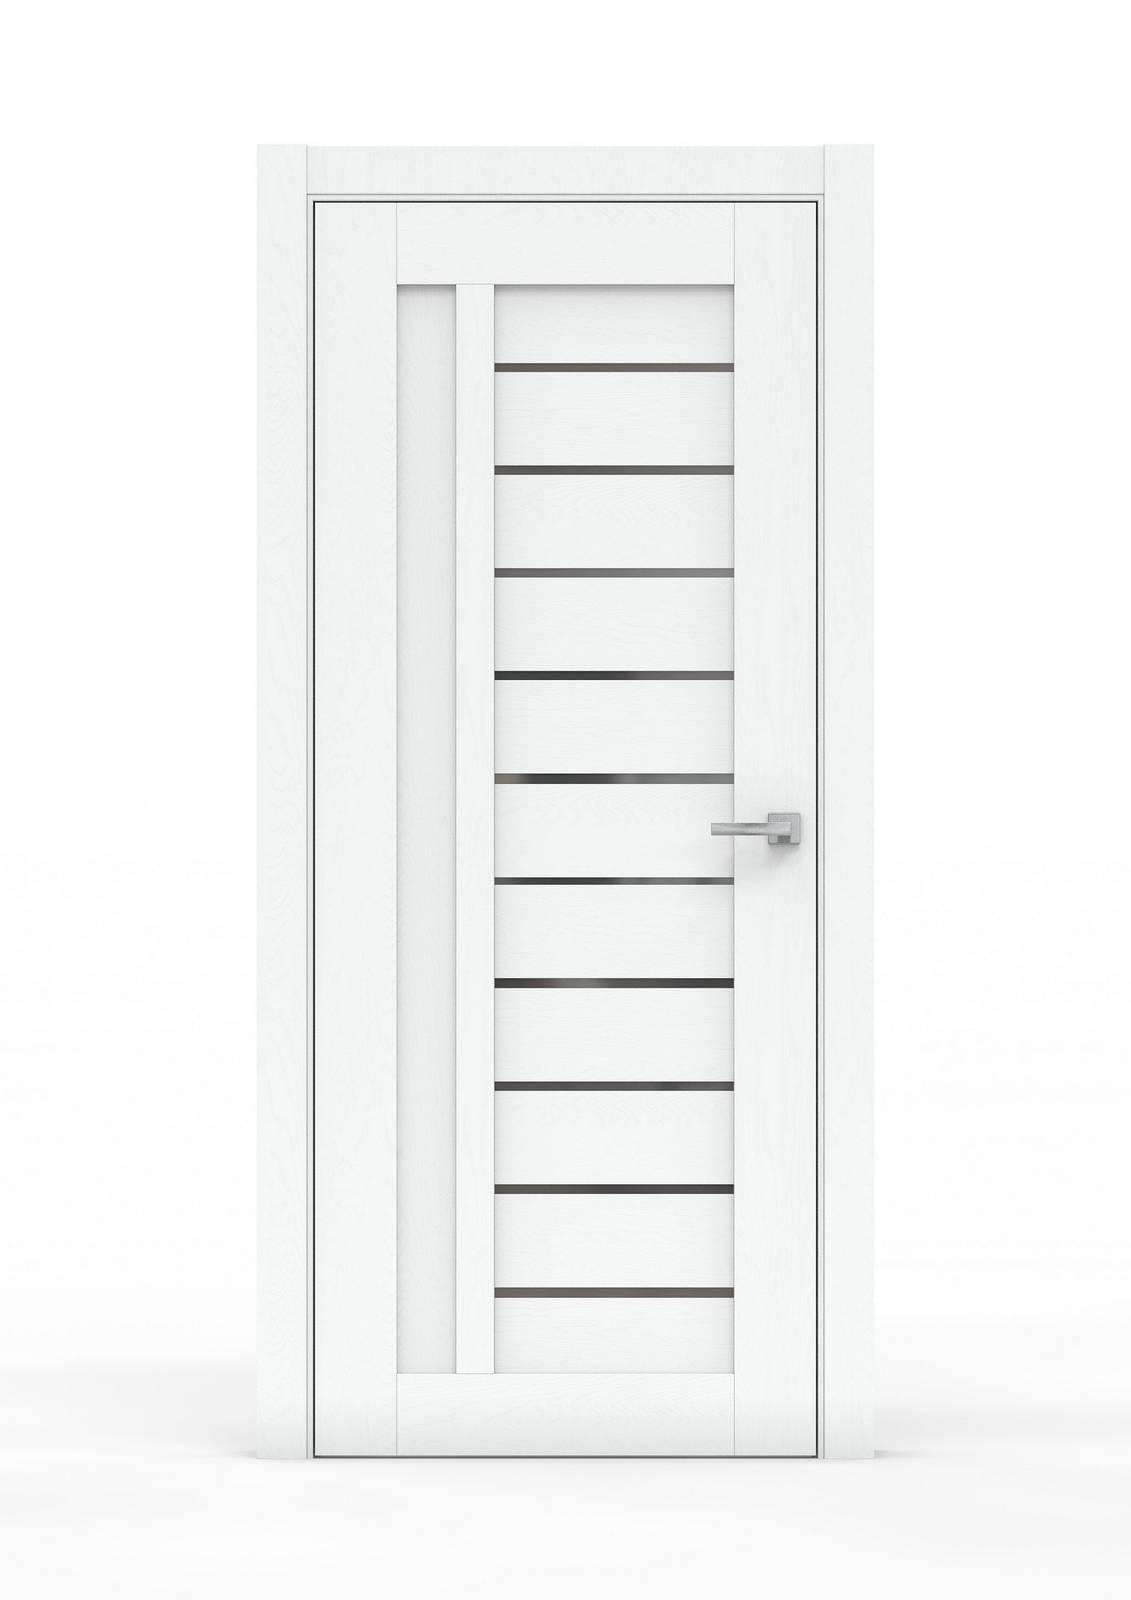 Межкомнатная дверь - 0691А. Цвет - Ясень Белый